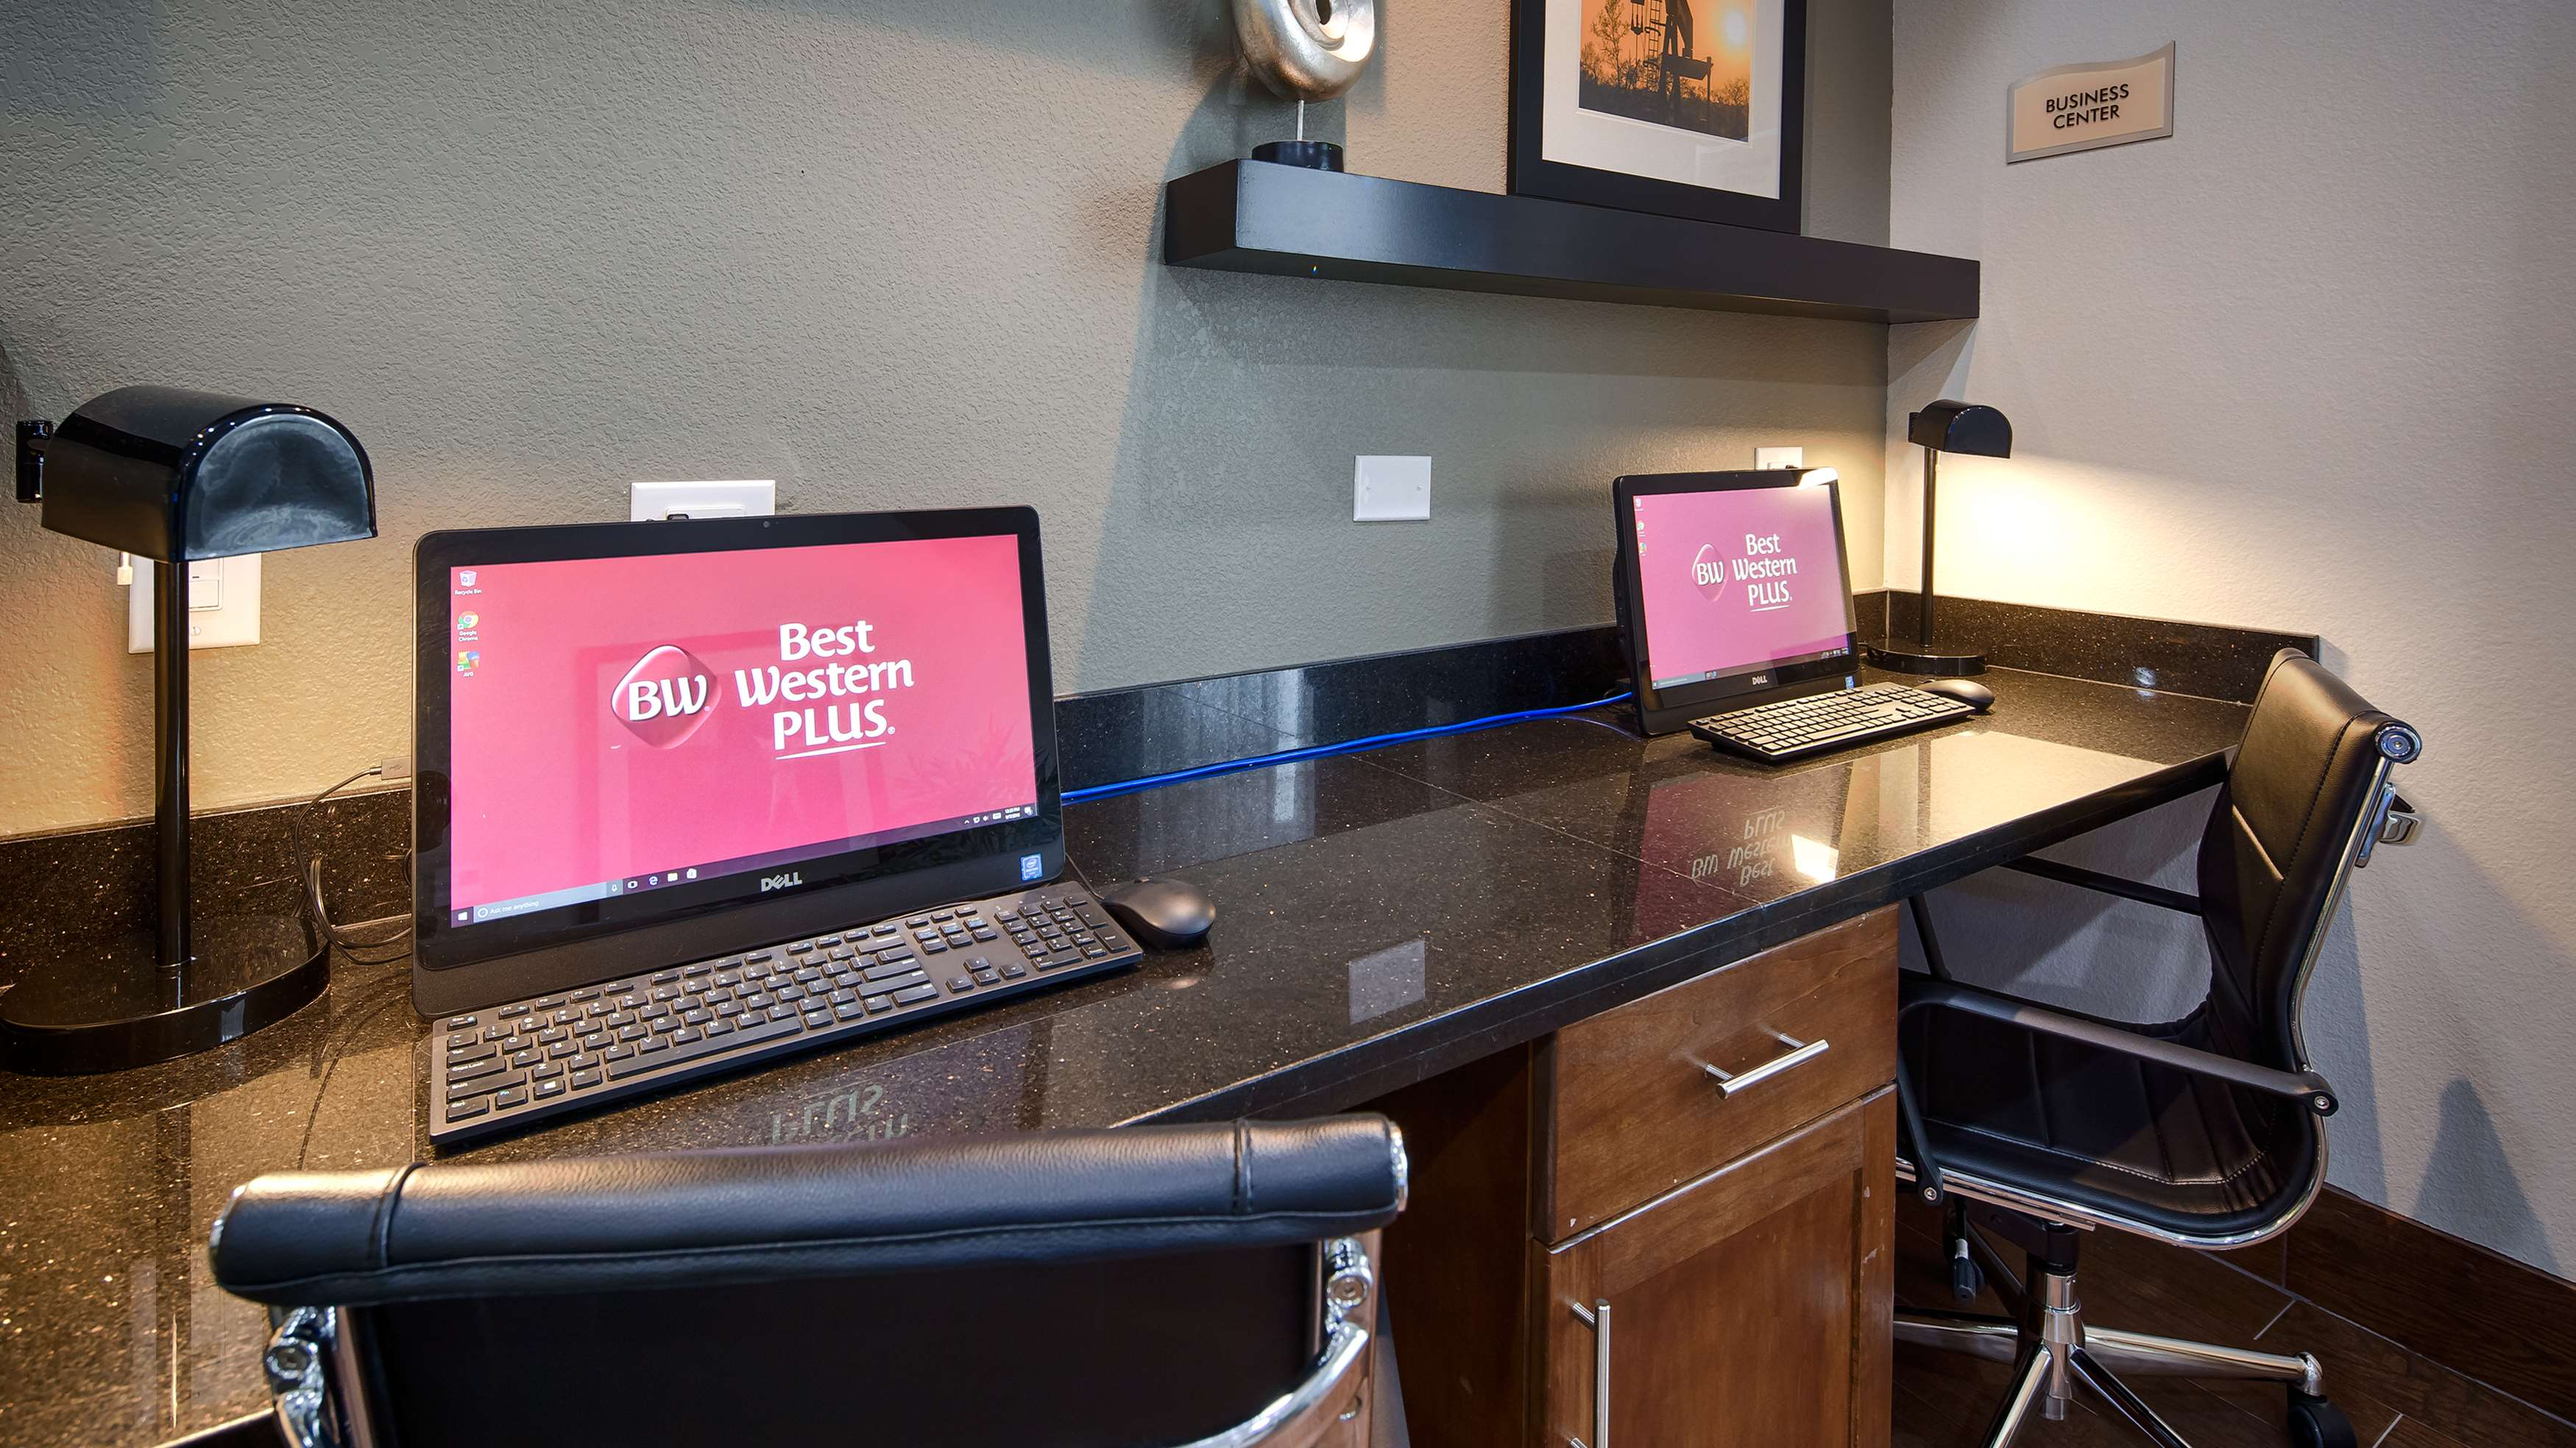 Best Western Plus Denver City Hotel & Suites image 4